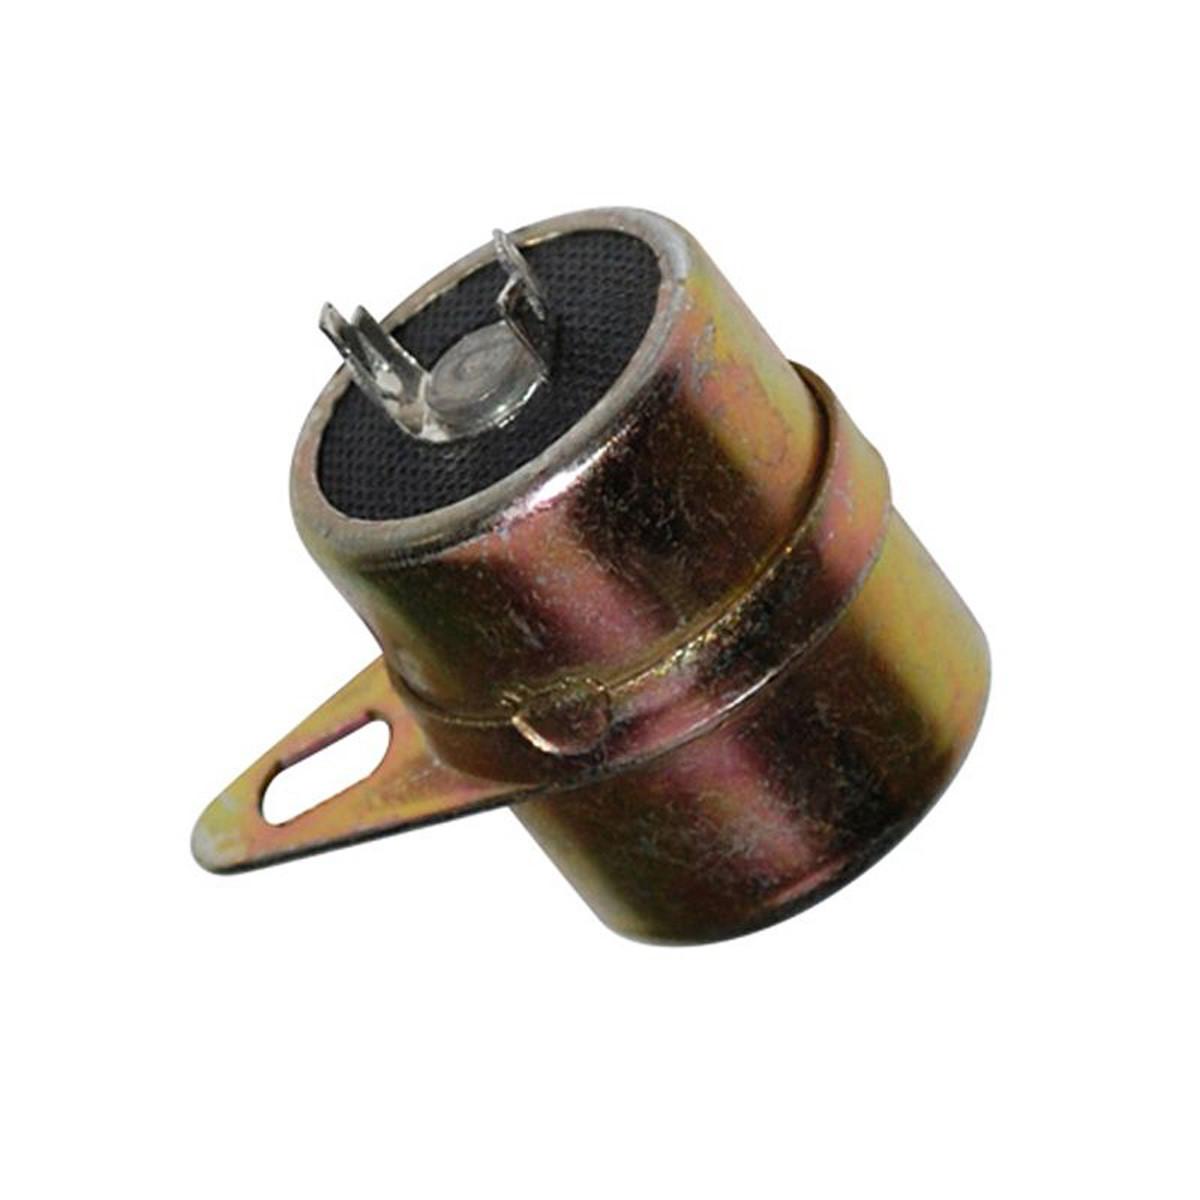 Condensateur Allumage Cyclo PEUGEOT 101, 102, 103, 104 - A Souder